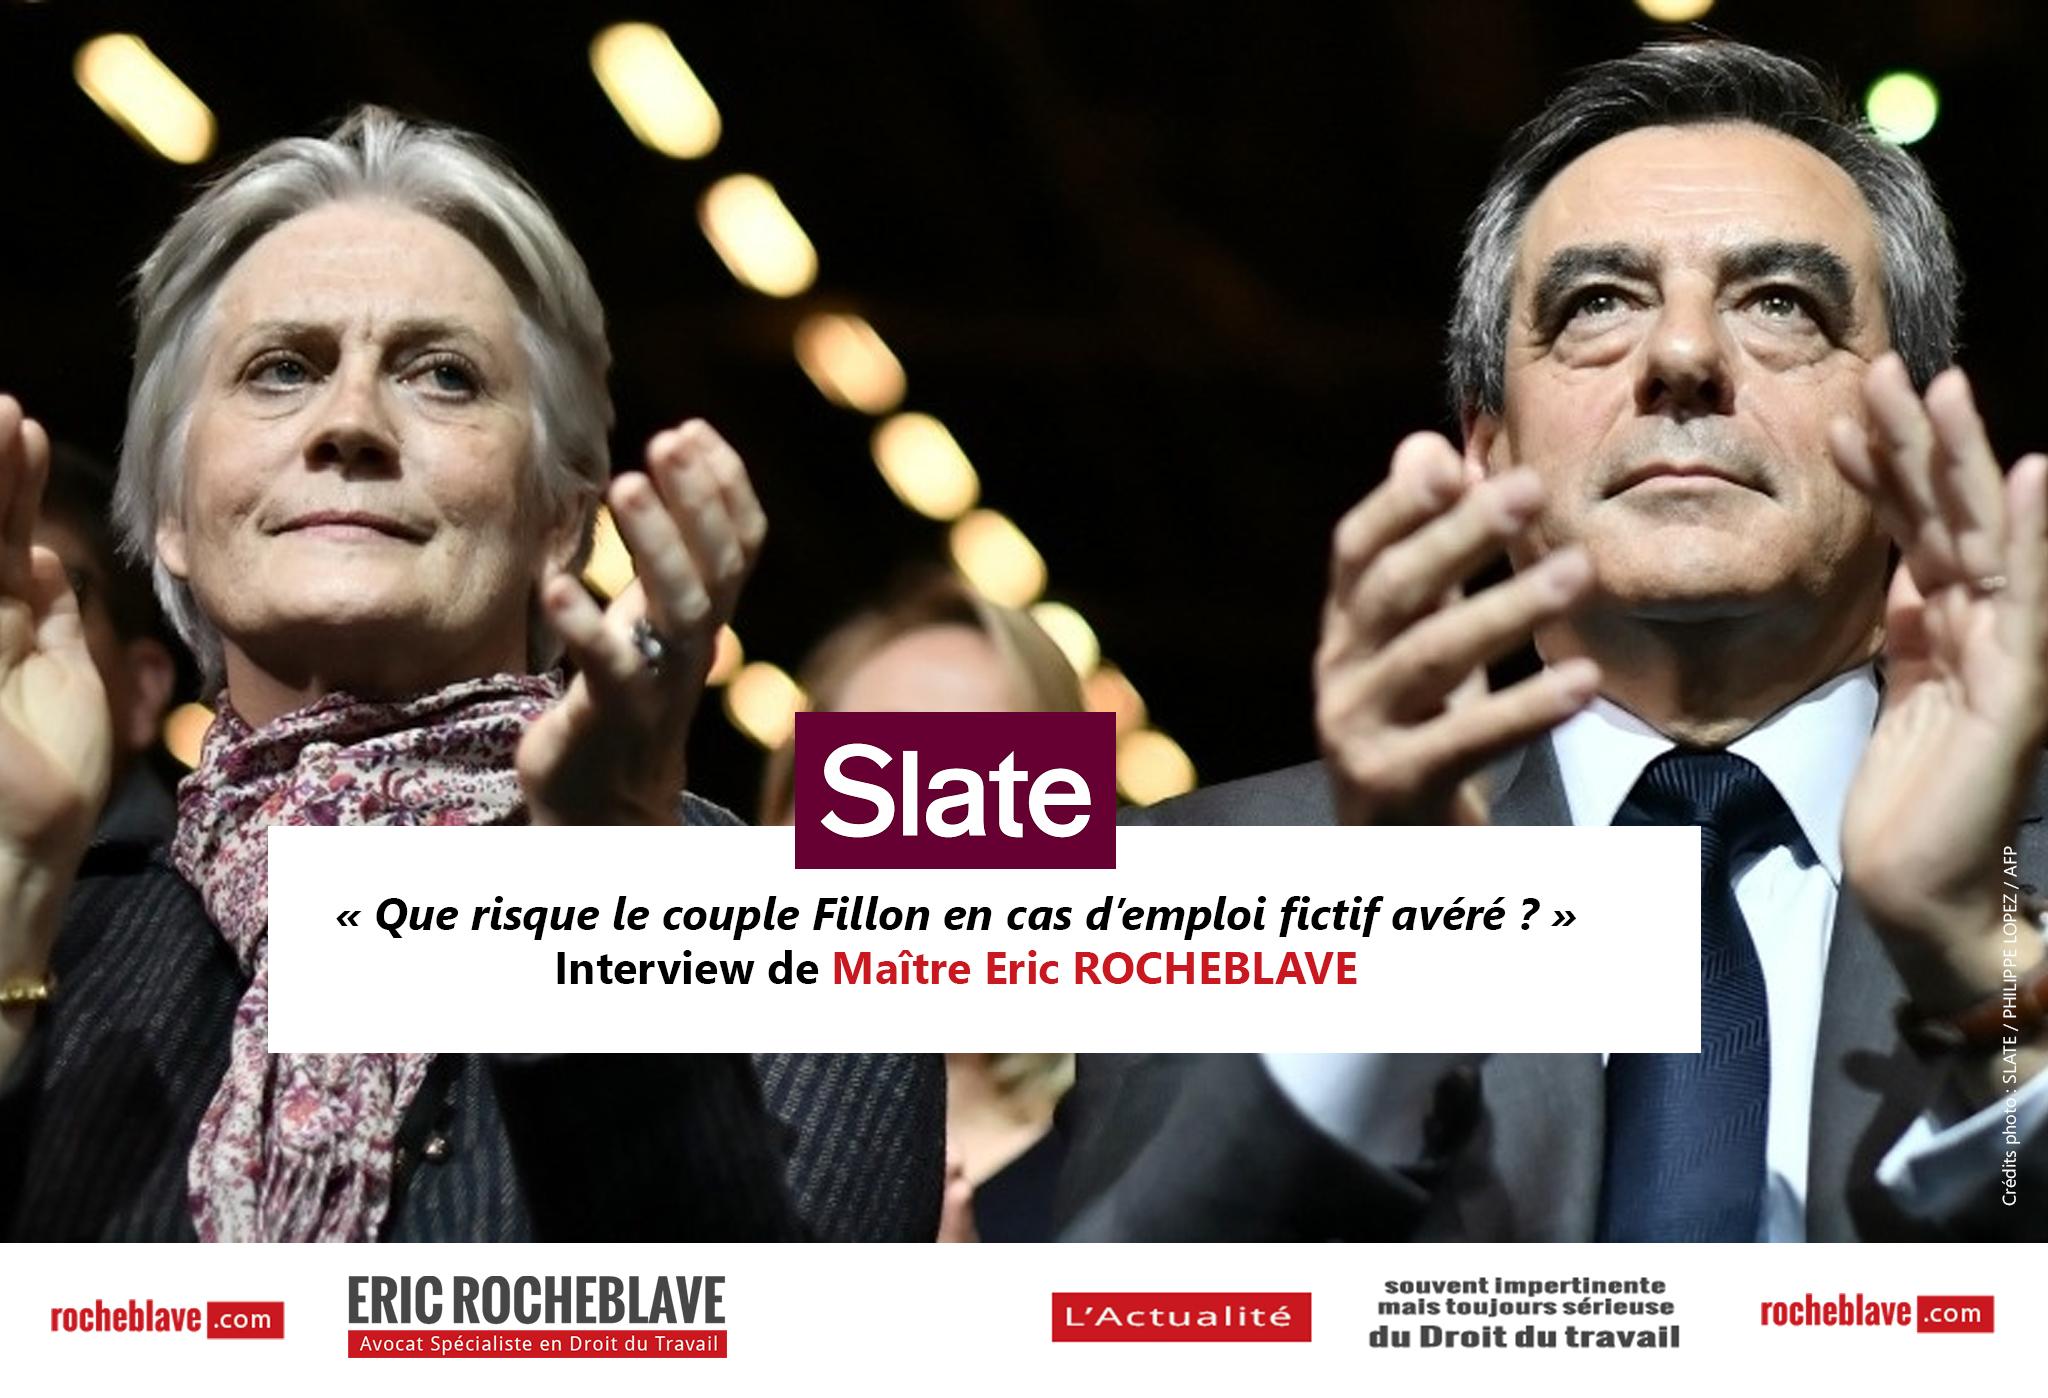 « Que risque le couple Fillon en cas d'emploi fictif avéré ? » Interview de Maître Eric ROCHEBLAVE | Slate